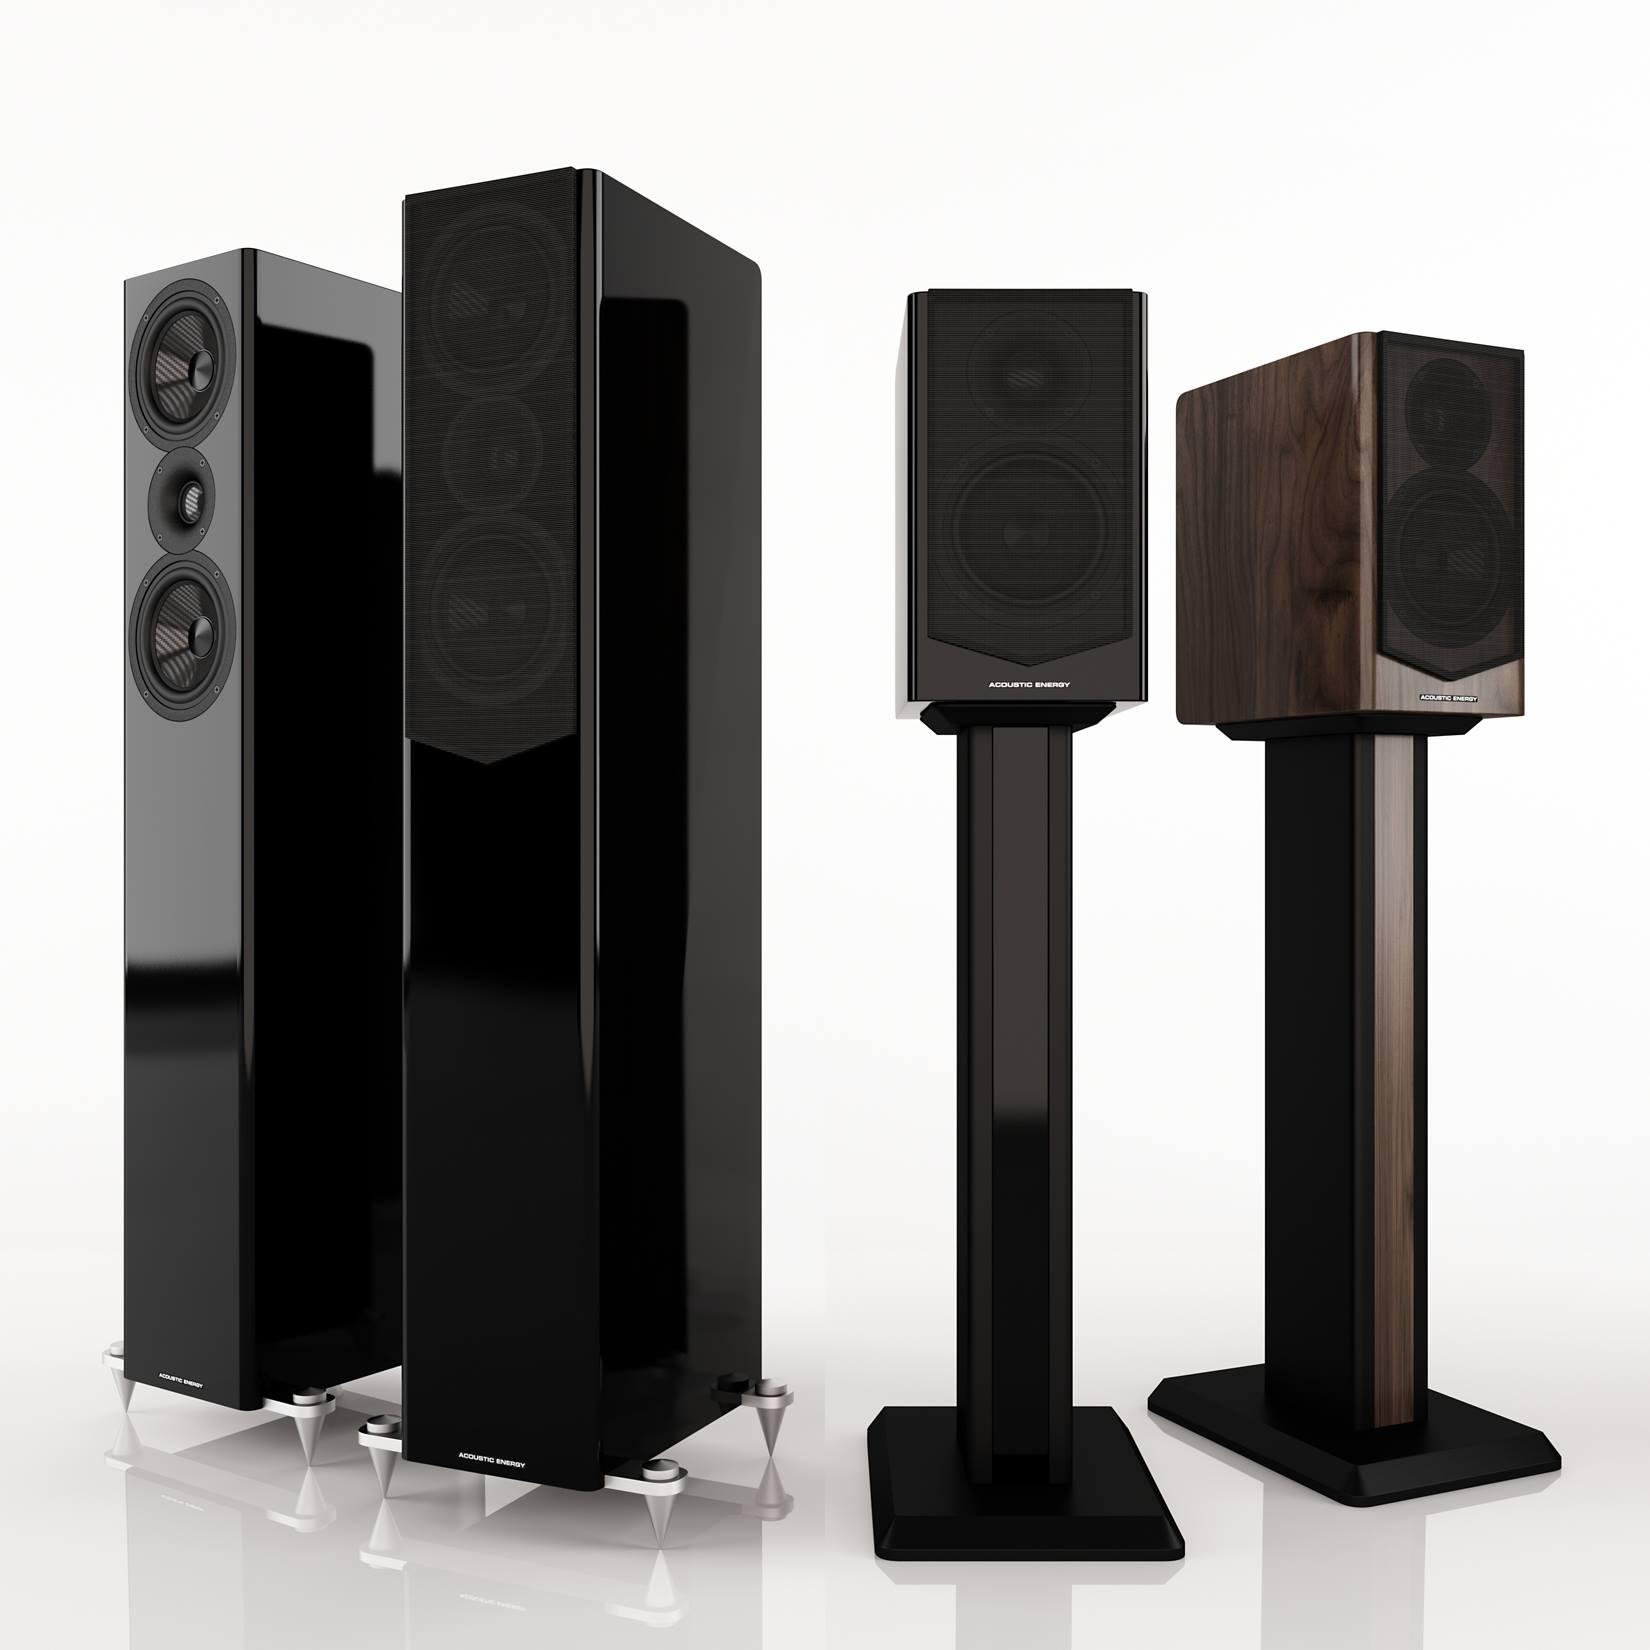 Lautsprecher AE 500er Serie von Acoustic Energy